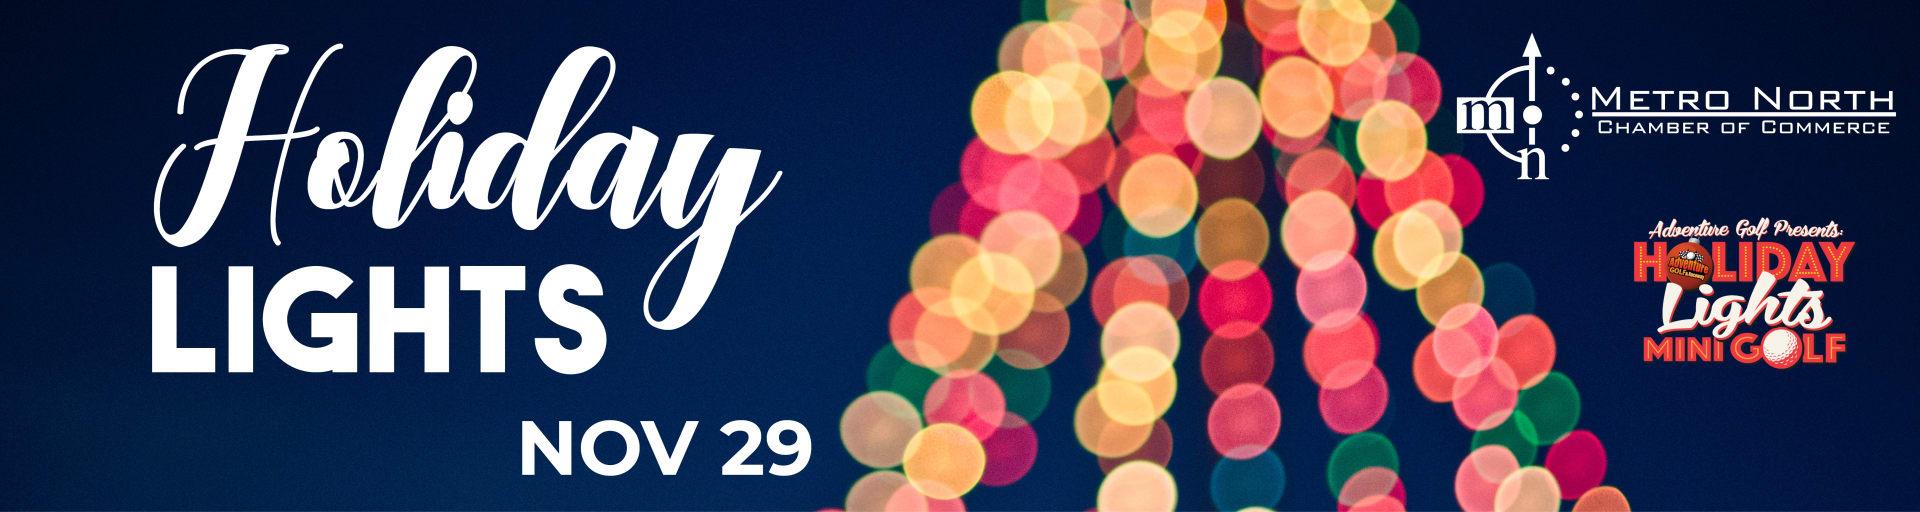 Holiday-Lights-Web-Banner(2)-w1920.jpg